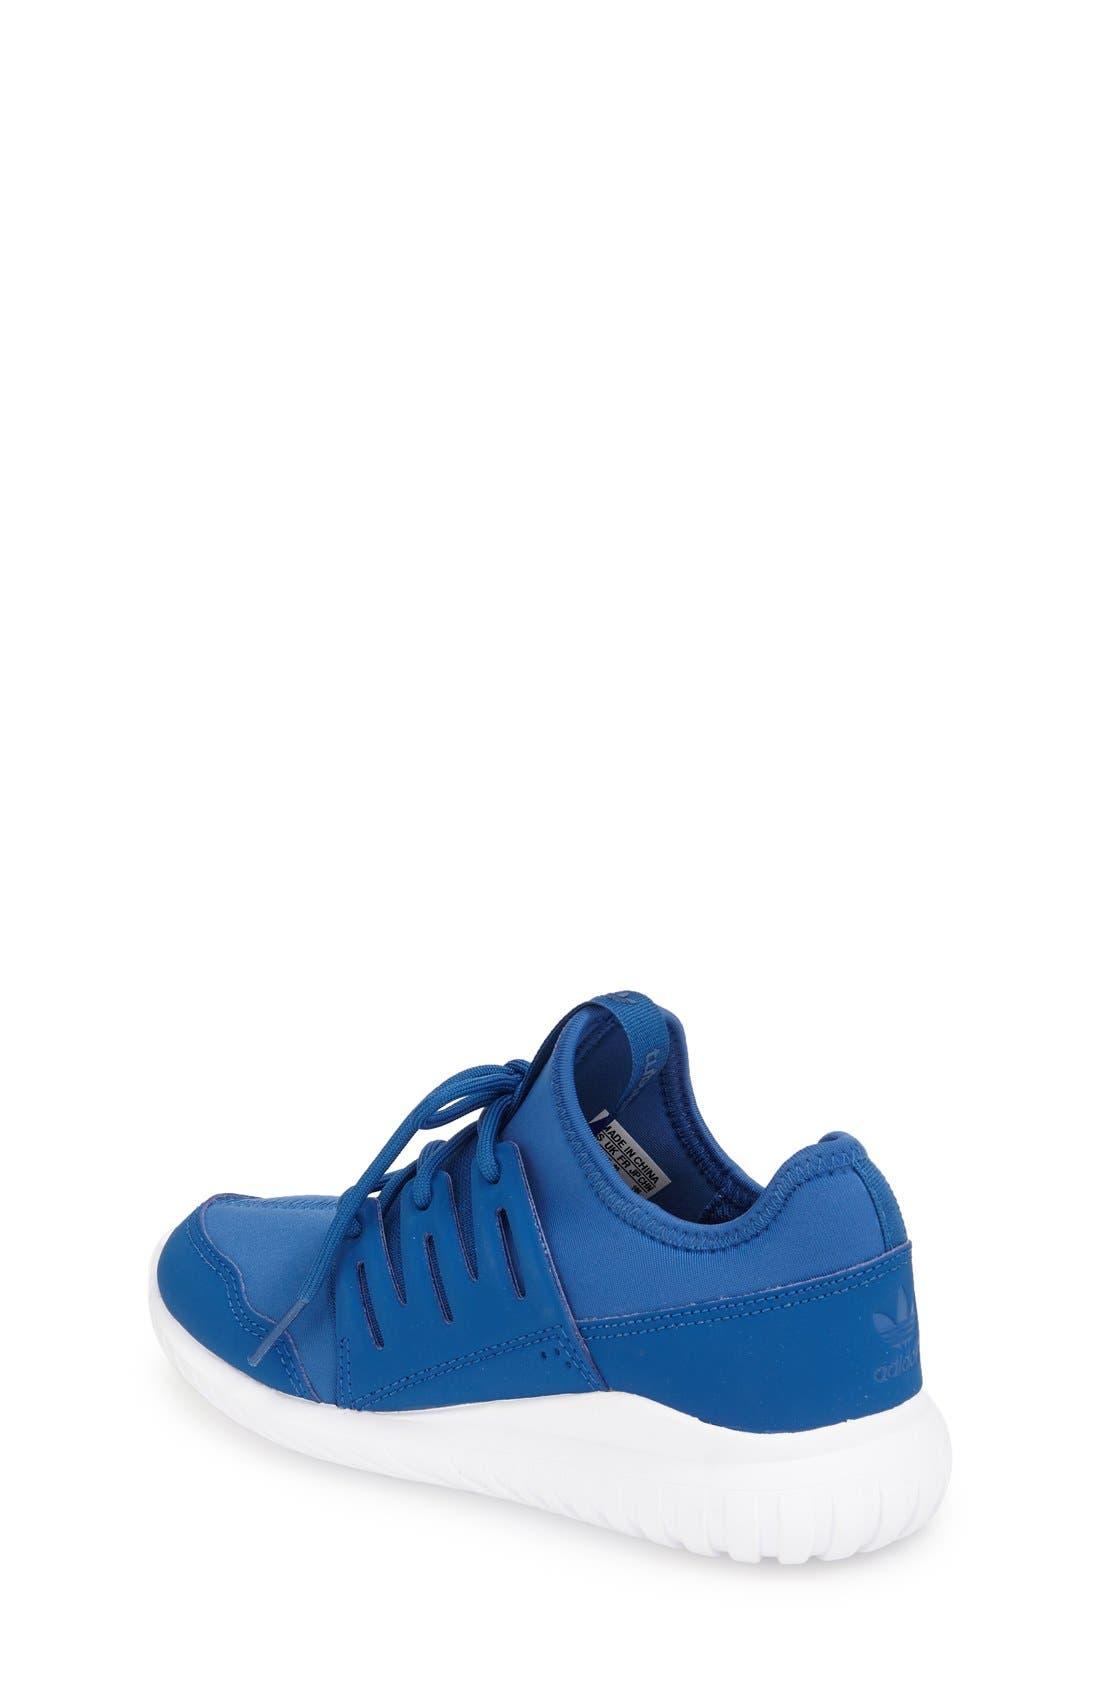 Alternate Image 2  - adidas 'Tubular Radial K' Sneaker (Toddler, Little Kid & Big Kid)